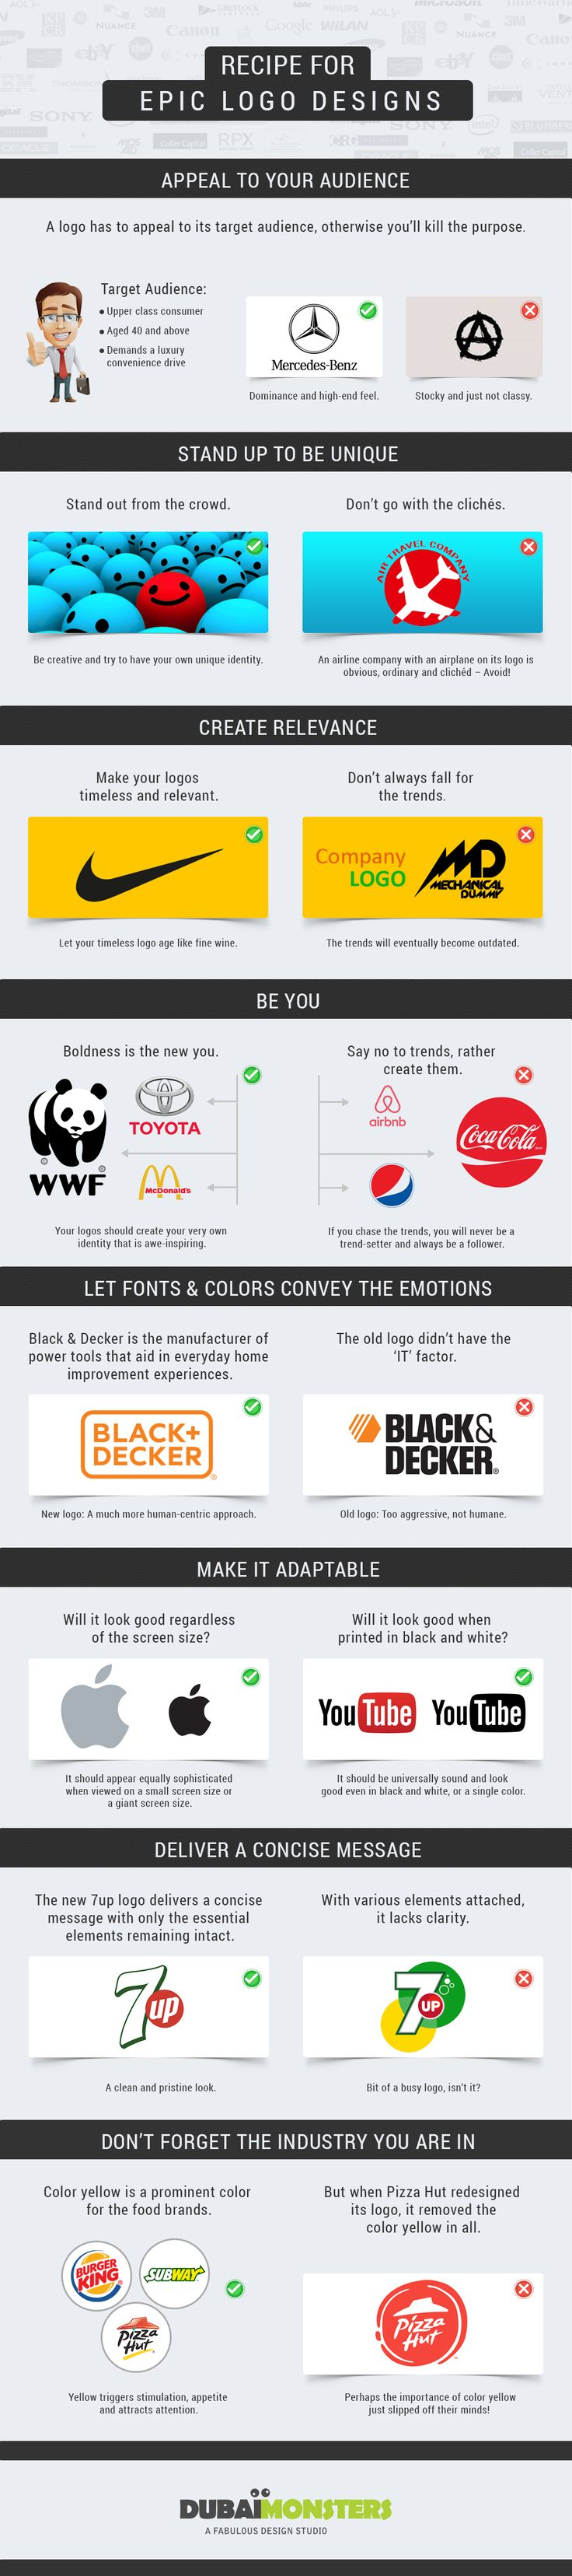 Recipe for Epic Logo Designs #Infographic #Design #Logo